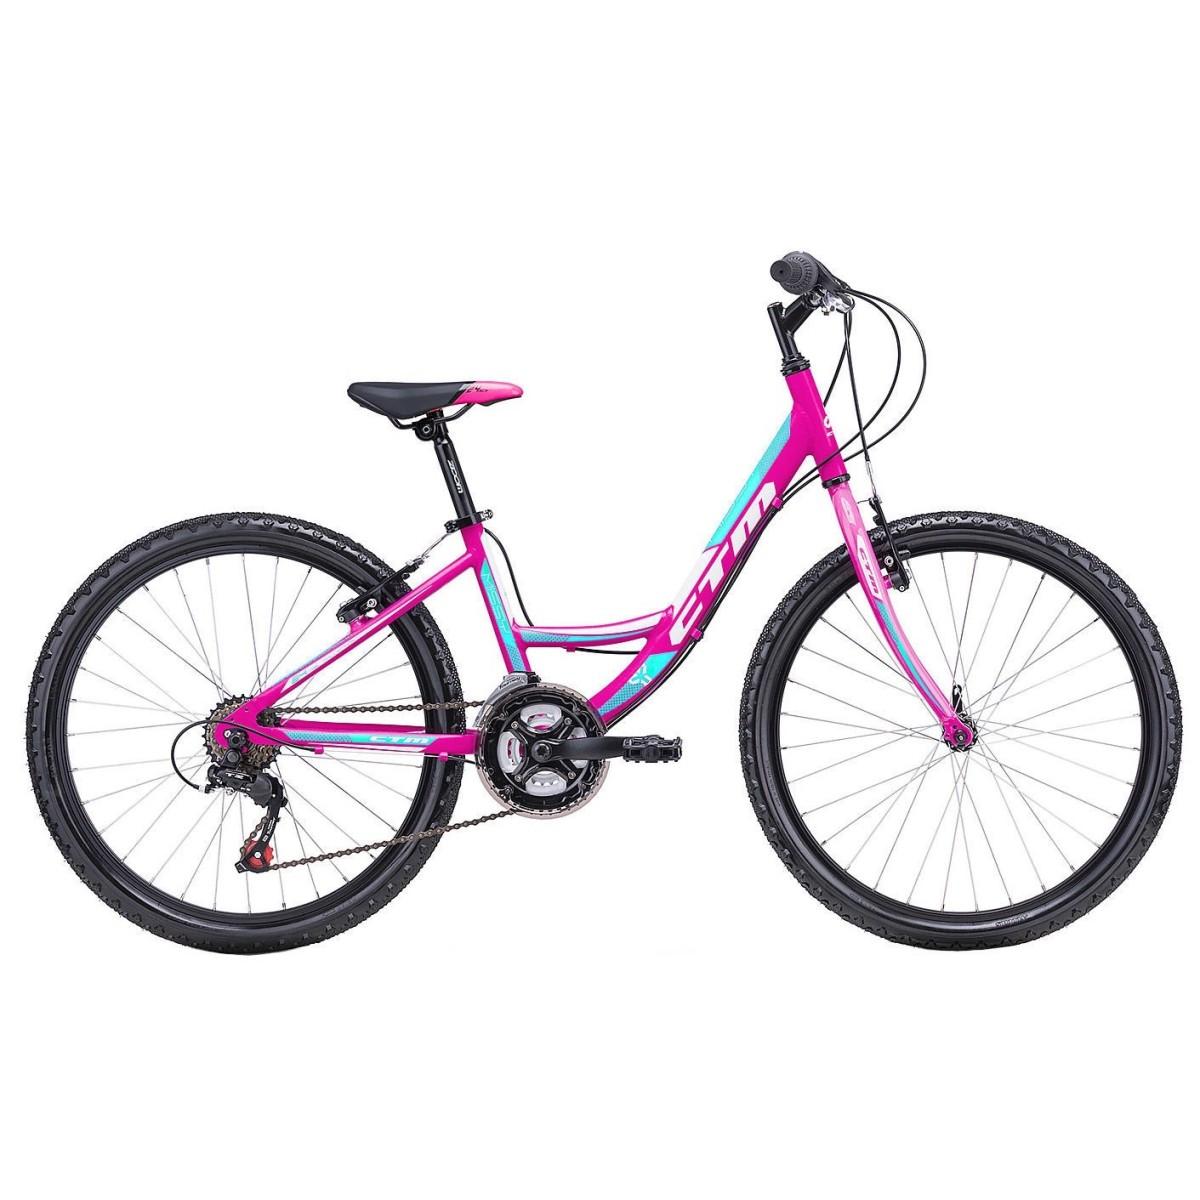 CTM Missy velosipēds bērniem